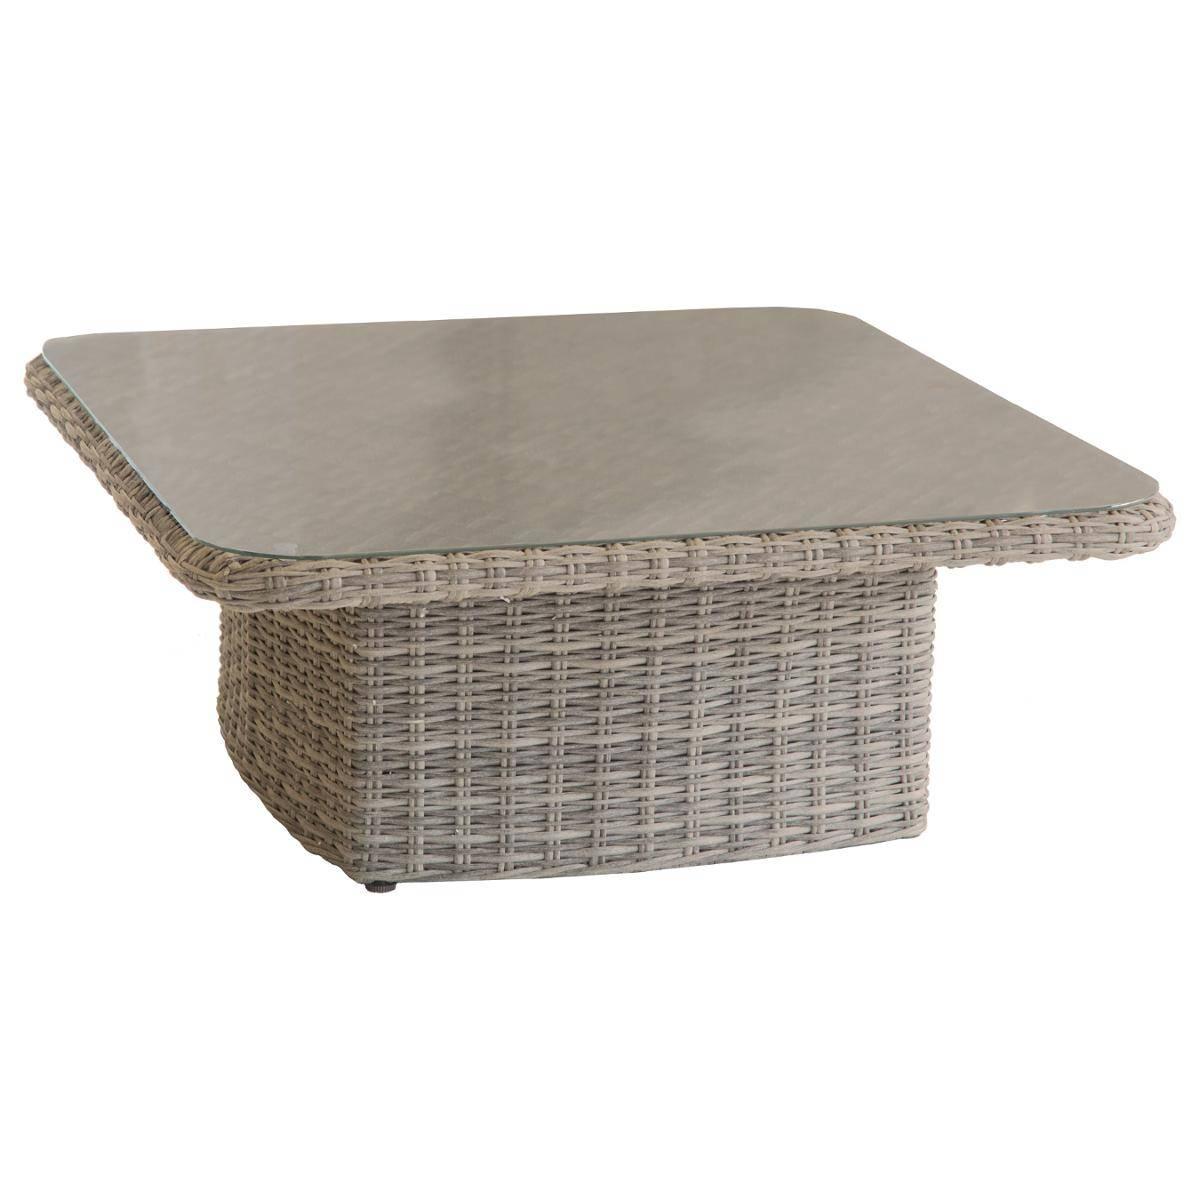 table basse carree relevable moorea naturae hesperide com